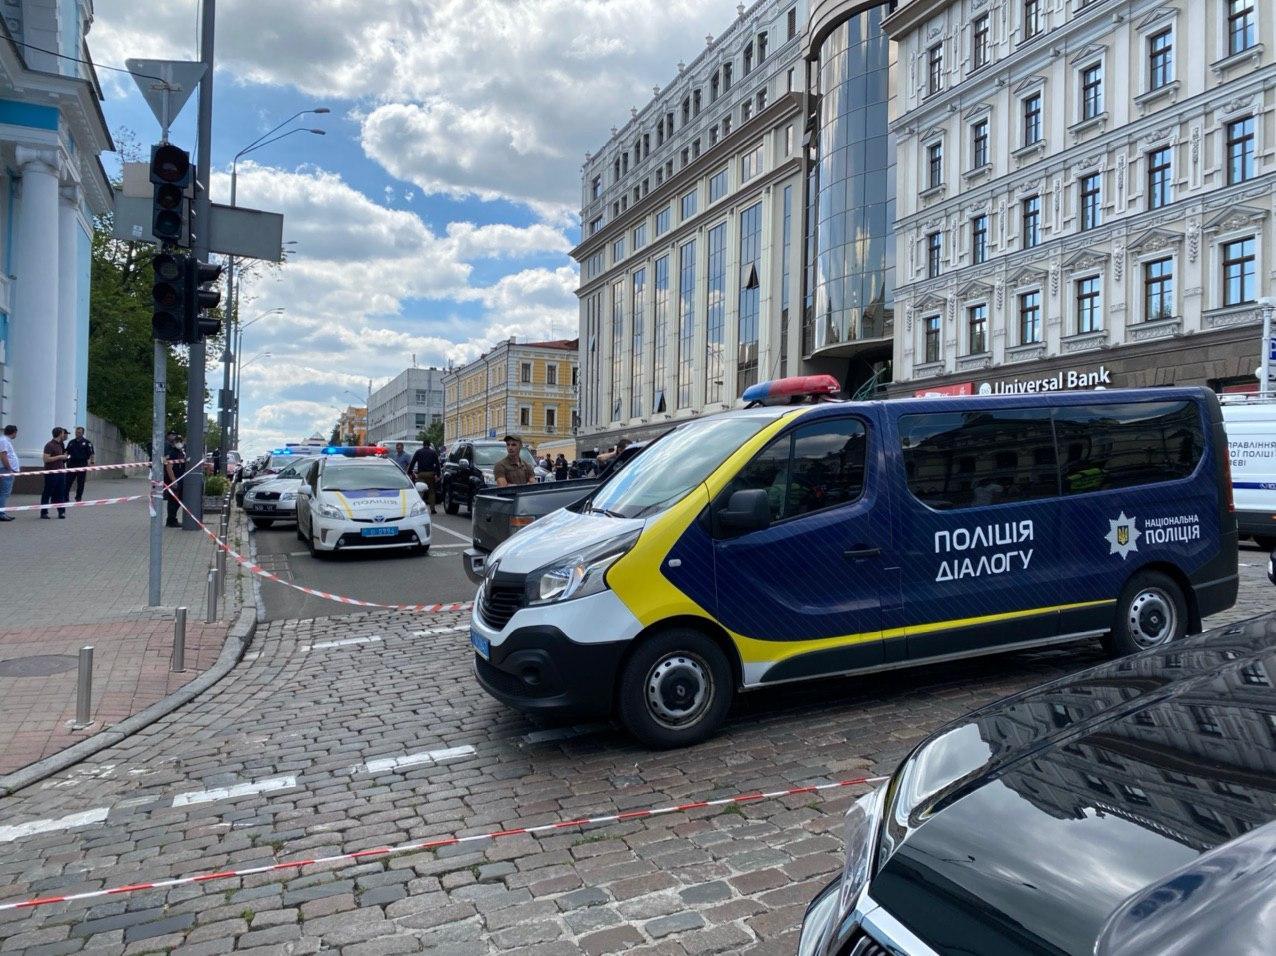 В центре Киева захвачен банк